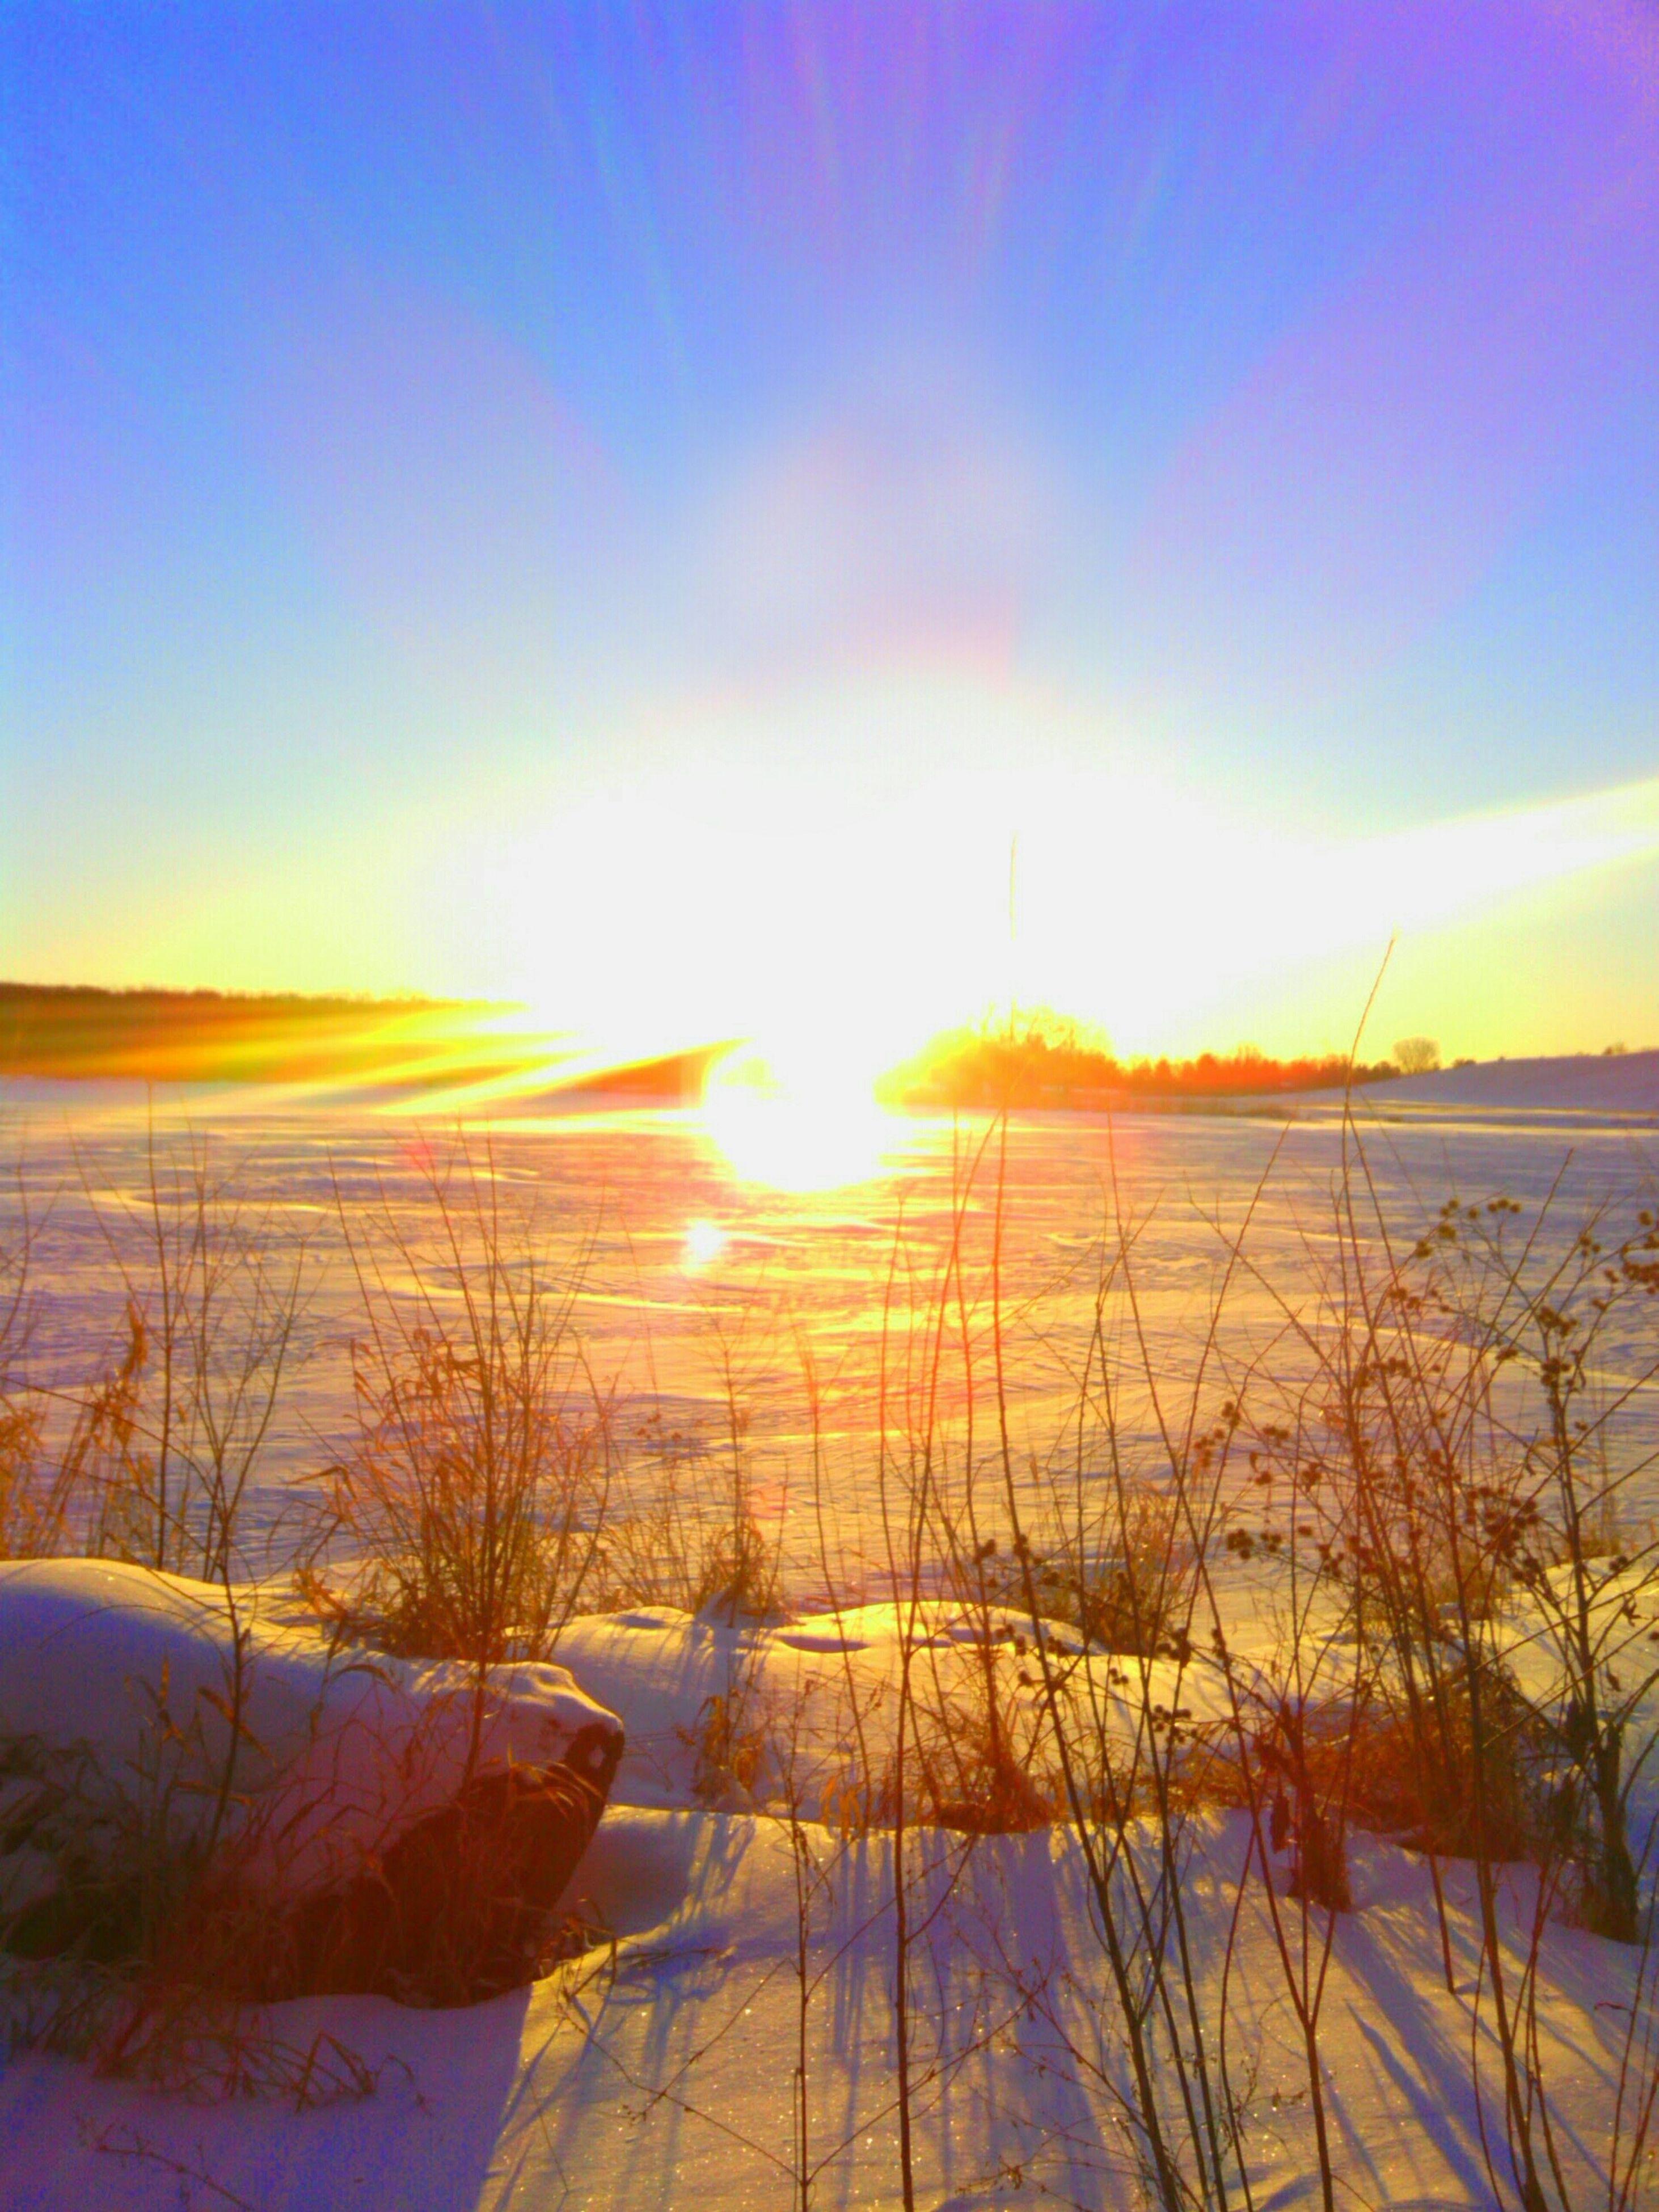 sunset, sun, tranquil scene, tranquility, scenics, beauty in nature, water, nature, sky, sunlight, idyllic, orange color, sea, reflection, horizon over water, lake, landscape, sunbeam, non-urban scene, lens flare